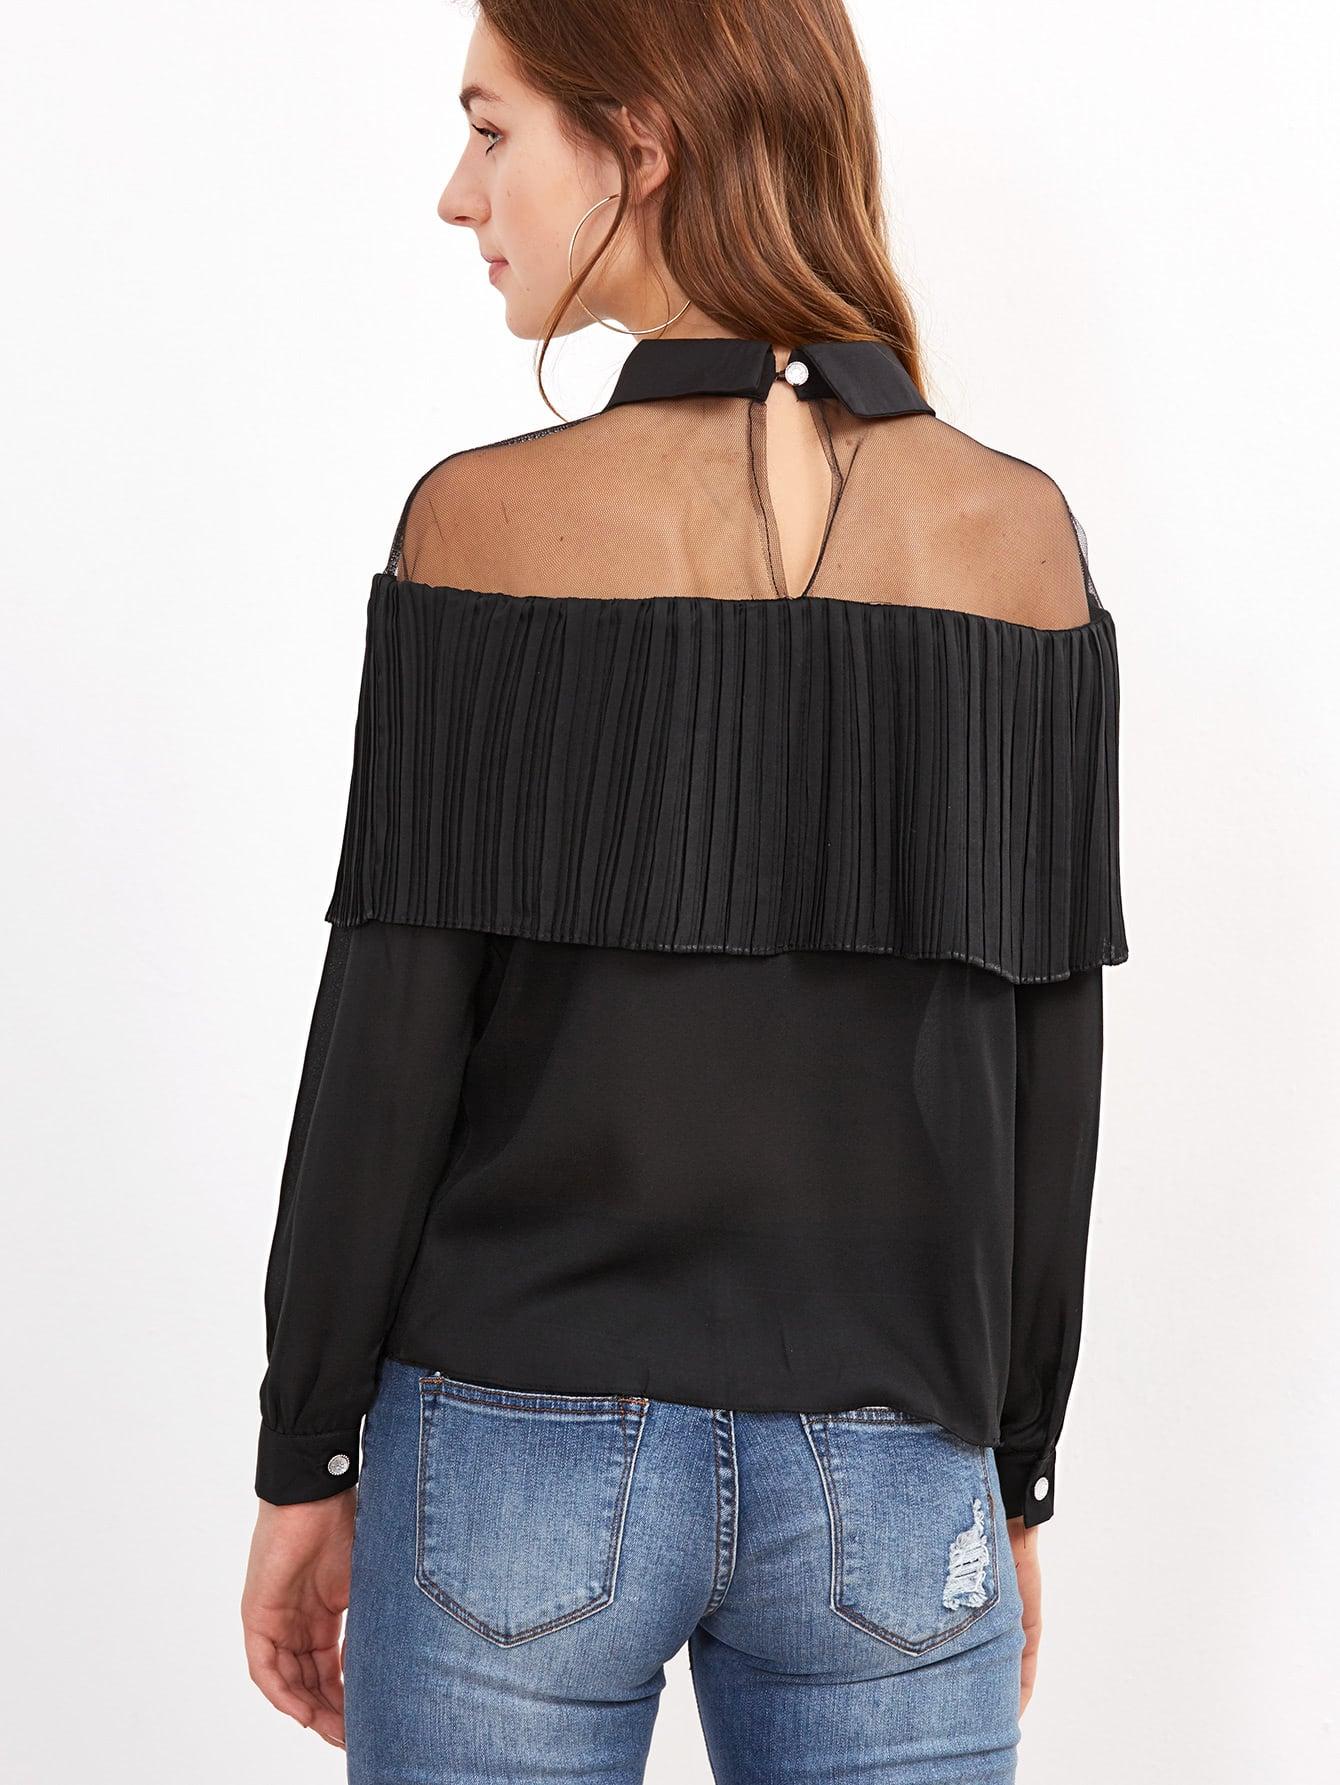 blouse161021301_2